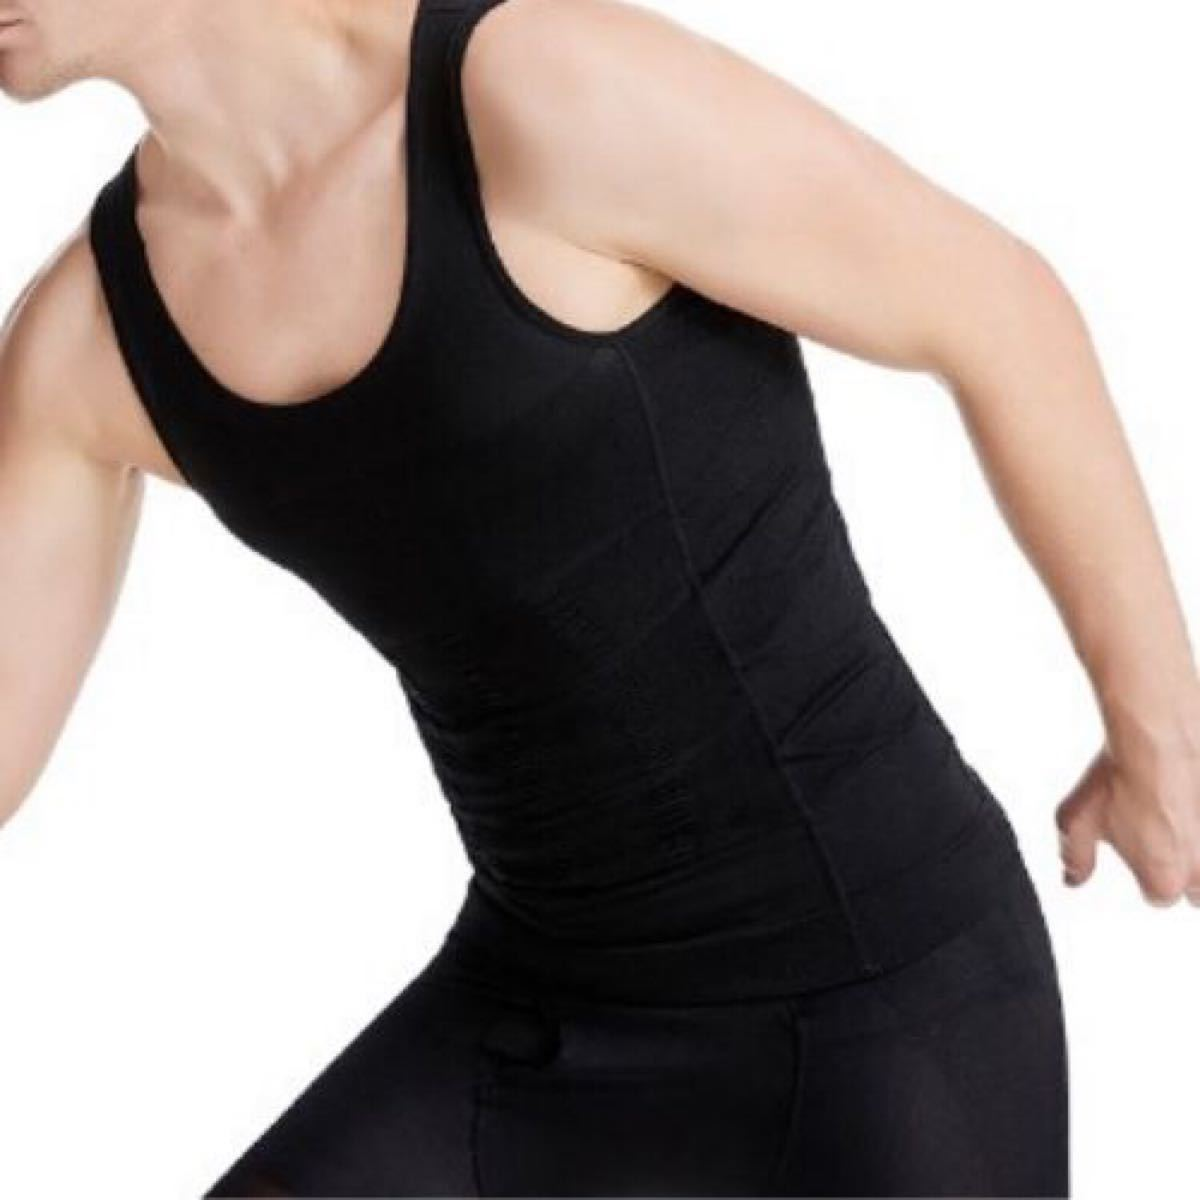 Mサイズ 加圧シャツ ブラック 体型維持 タンクトップ 加圧インナー 黒色